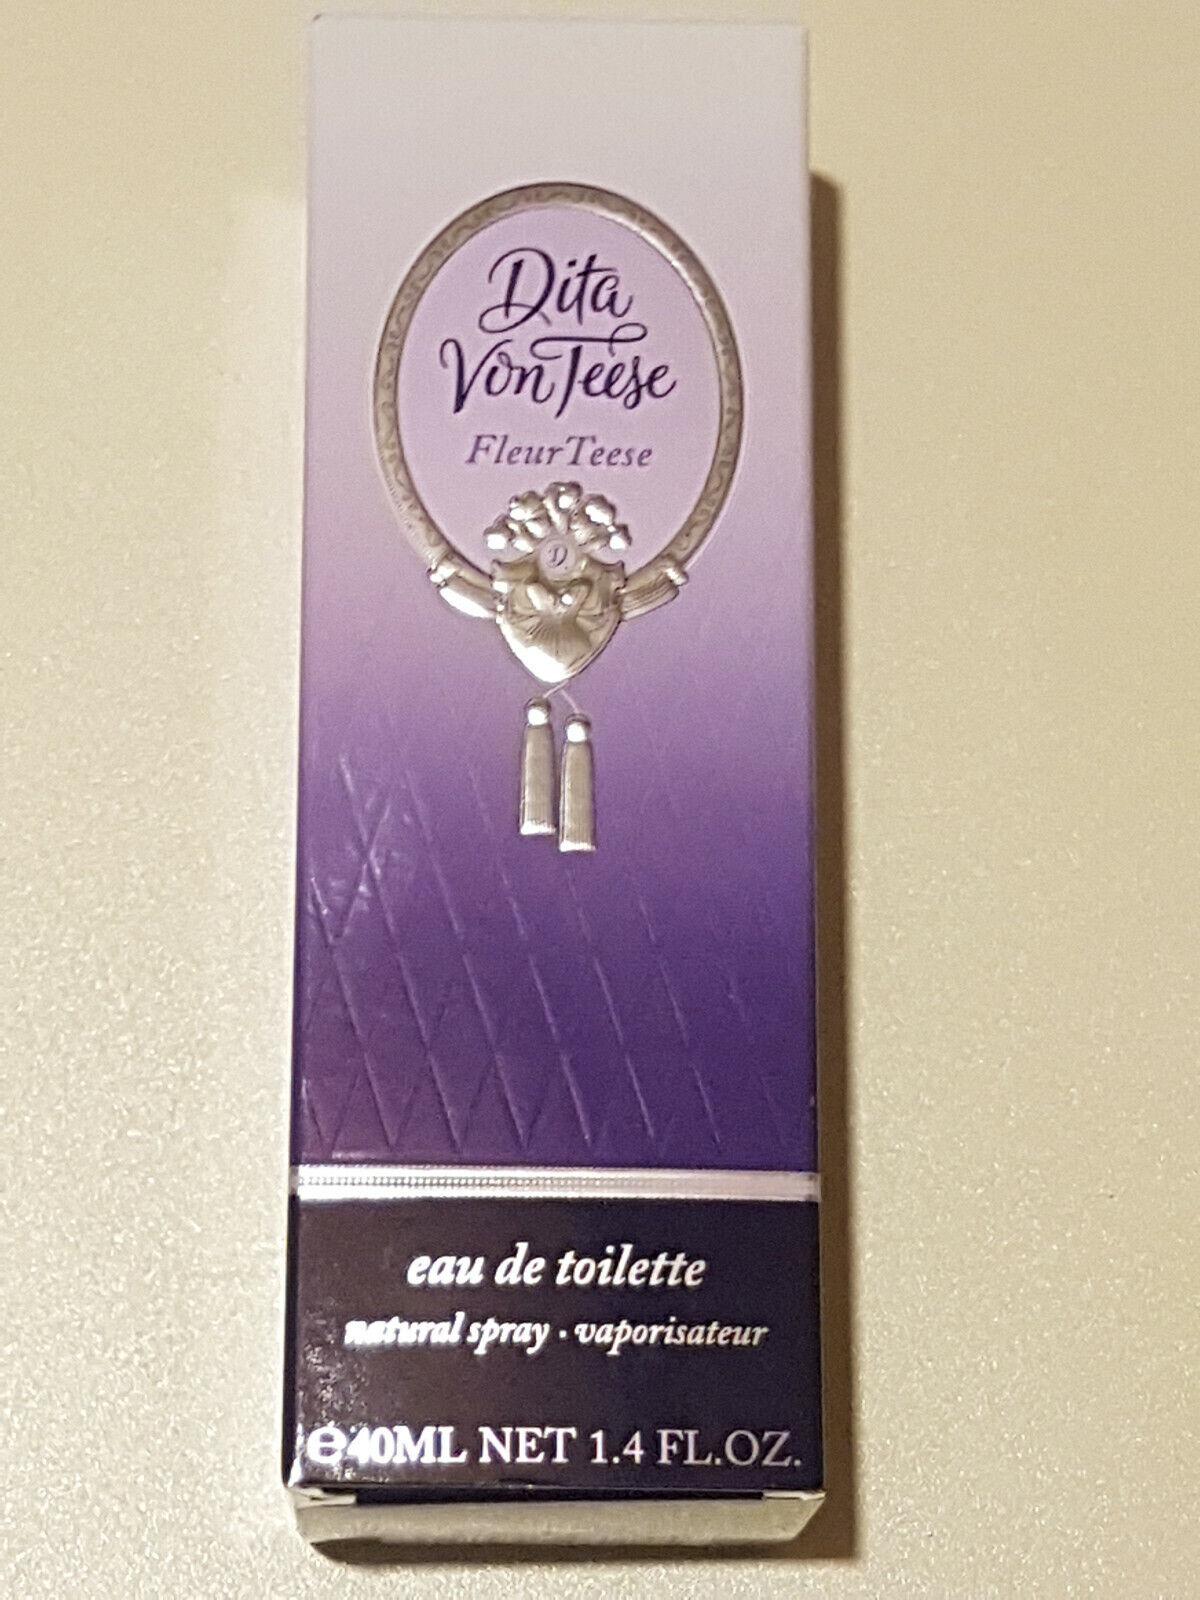 Dita von Teese Fleur Teese 40 ml EdT Eau de Toilette for woman FleurTeese OVP